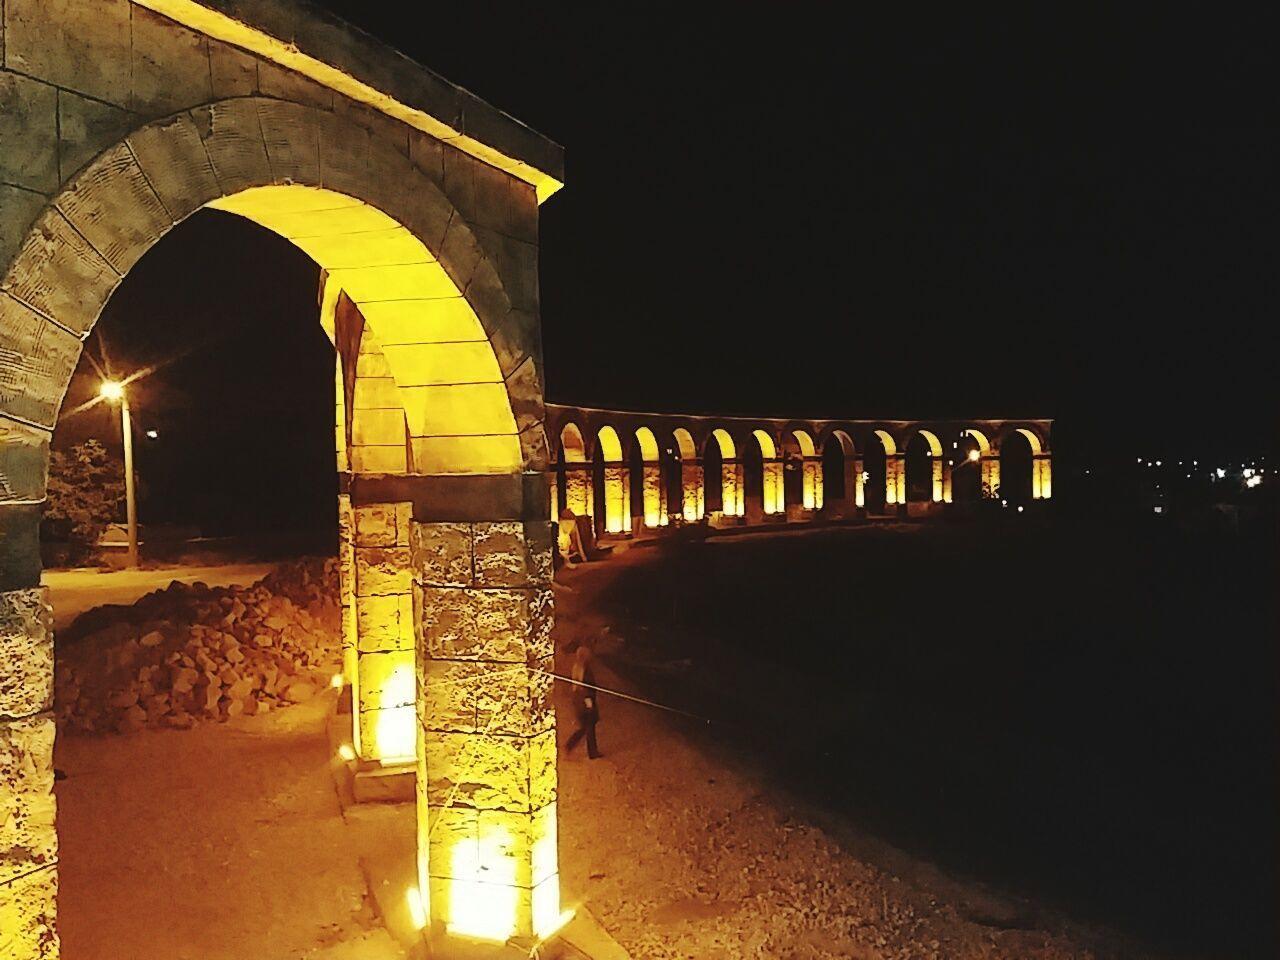 Night Built Structure Outdoors Arch City Building Bridge - Man Made Structure Buildingstyles Built